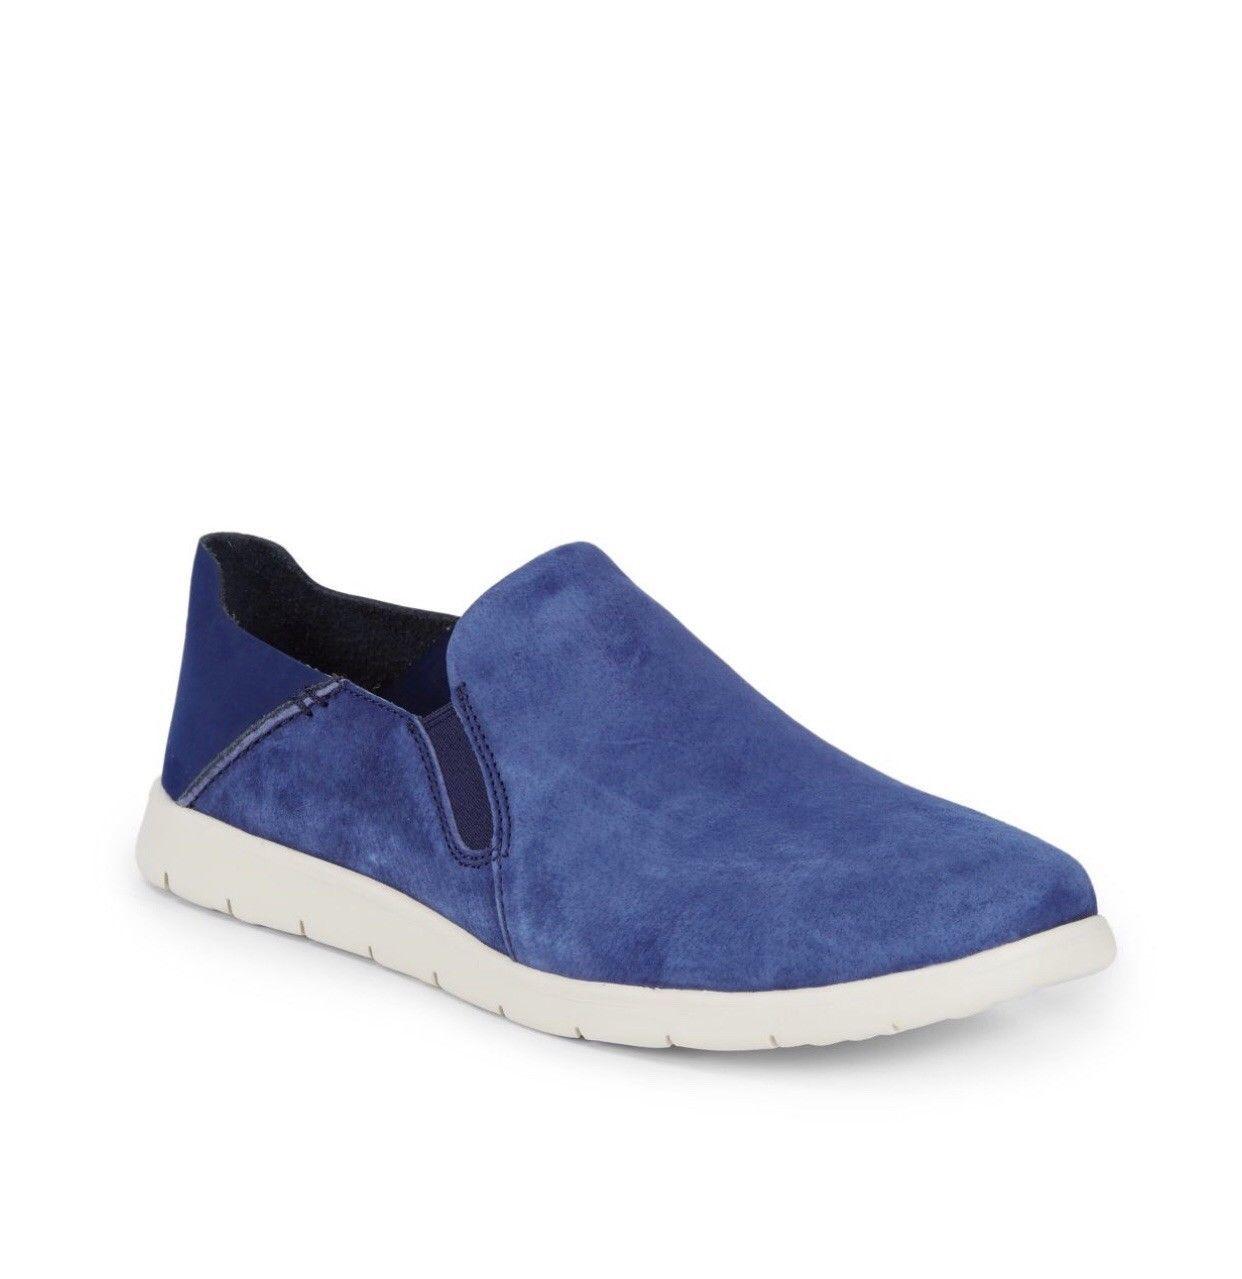 NEW UGG Men's Knox Suede Slip On Sneaker, Sizes 9, 11  Blue, MSRP $100 image 2